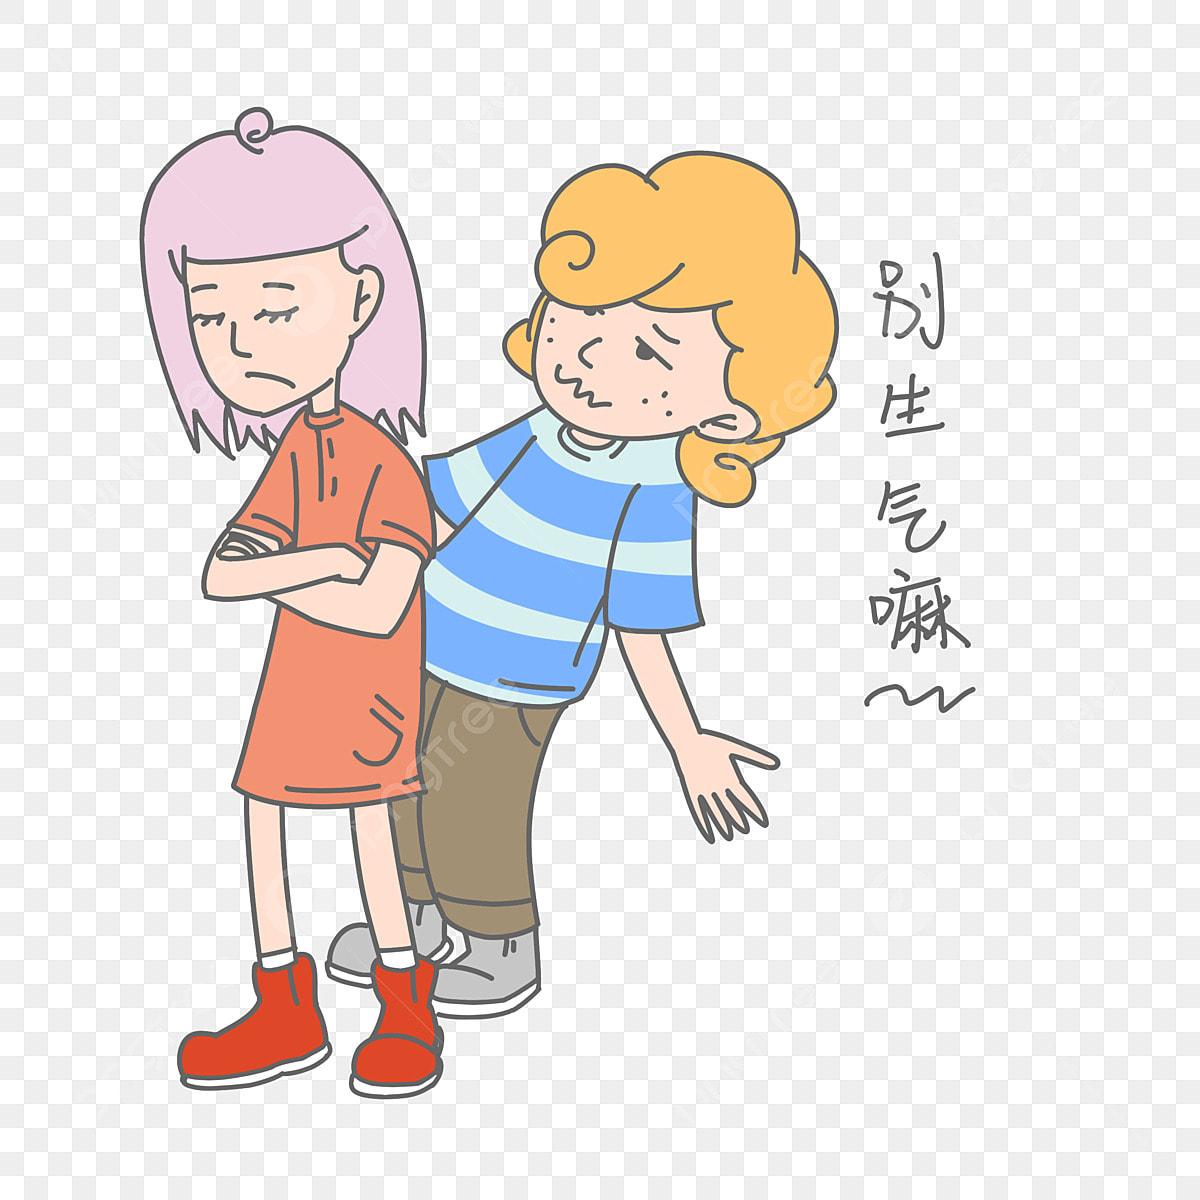 Tanabata El Amor Pareja No Te Enojes Amor Emoticonos Matrimonio